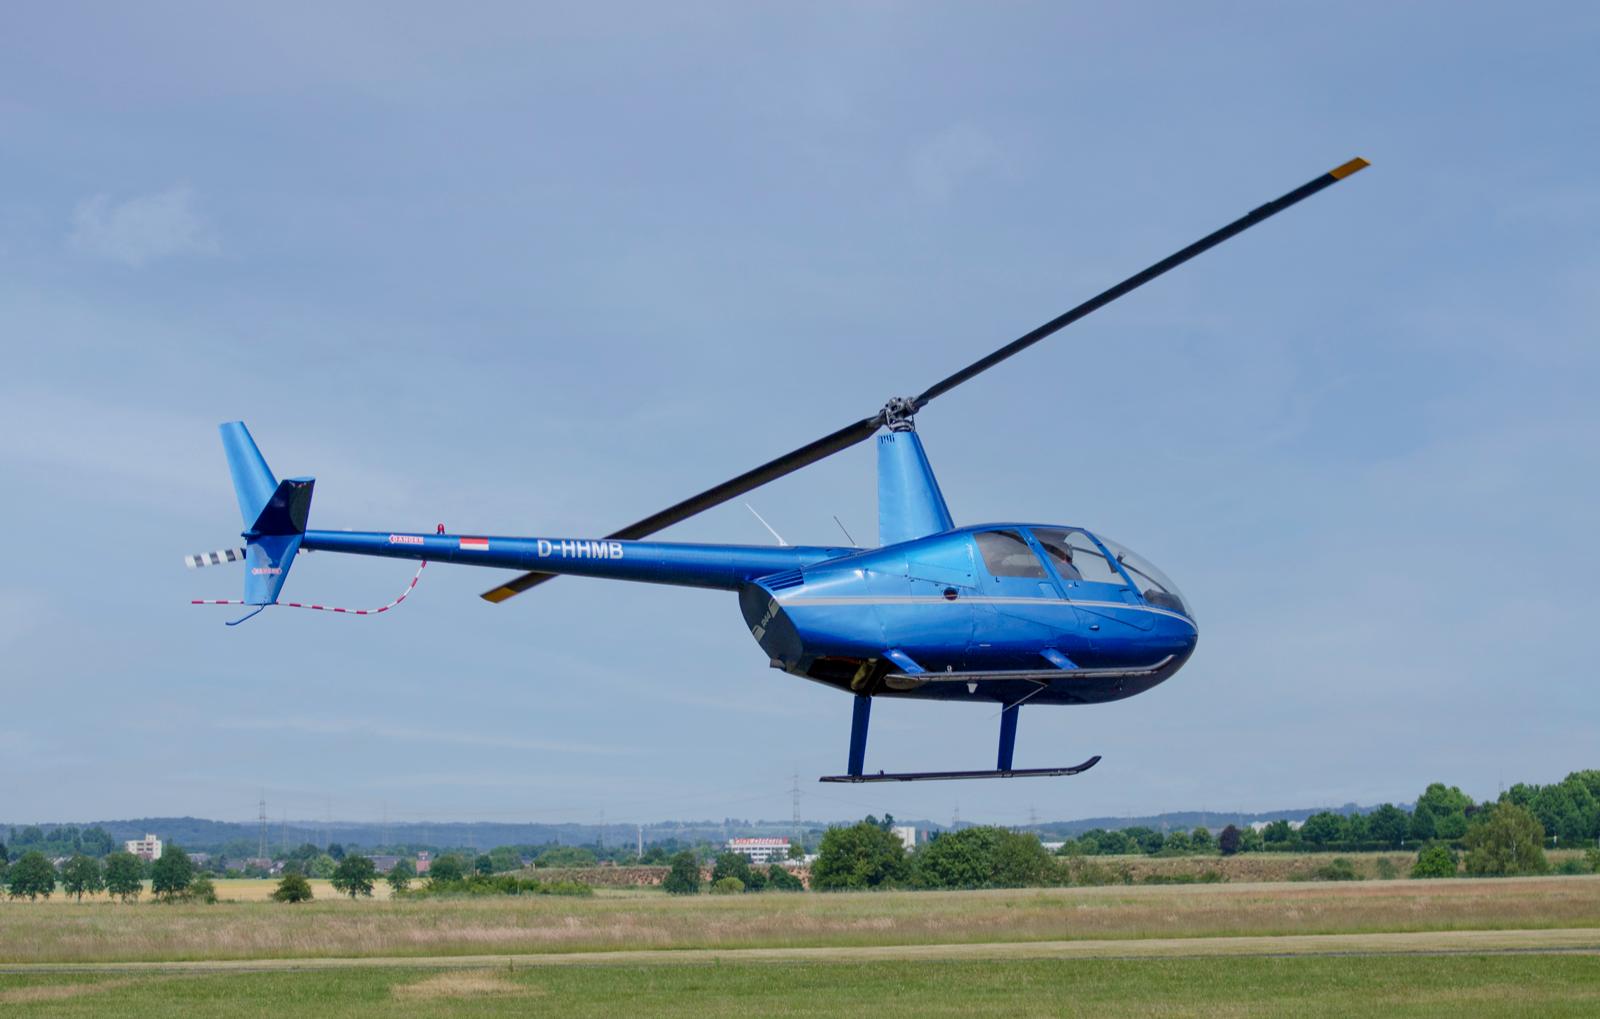 romantik-hubschrauber-rundflug-chemnitz-bg2